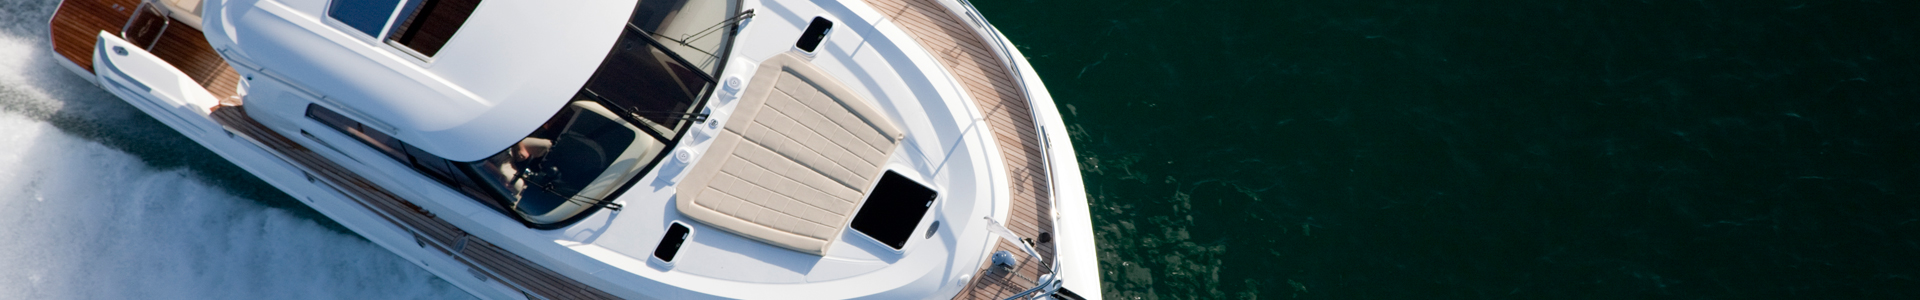 slidenarrow-boat